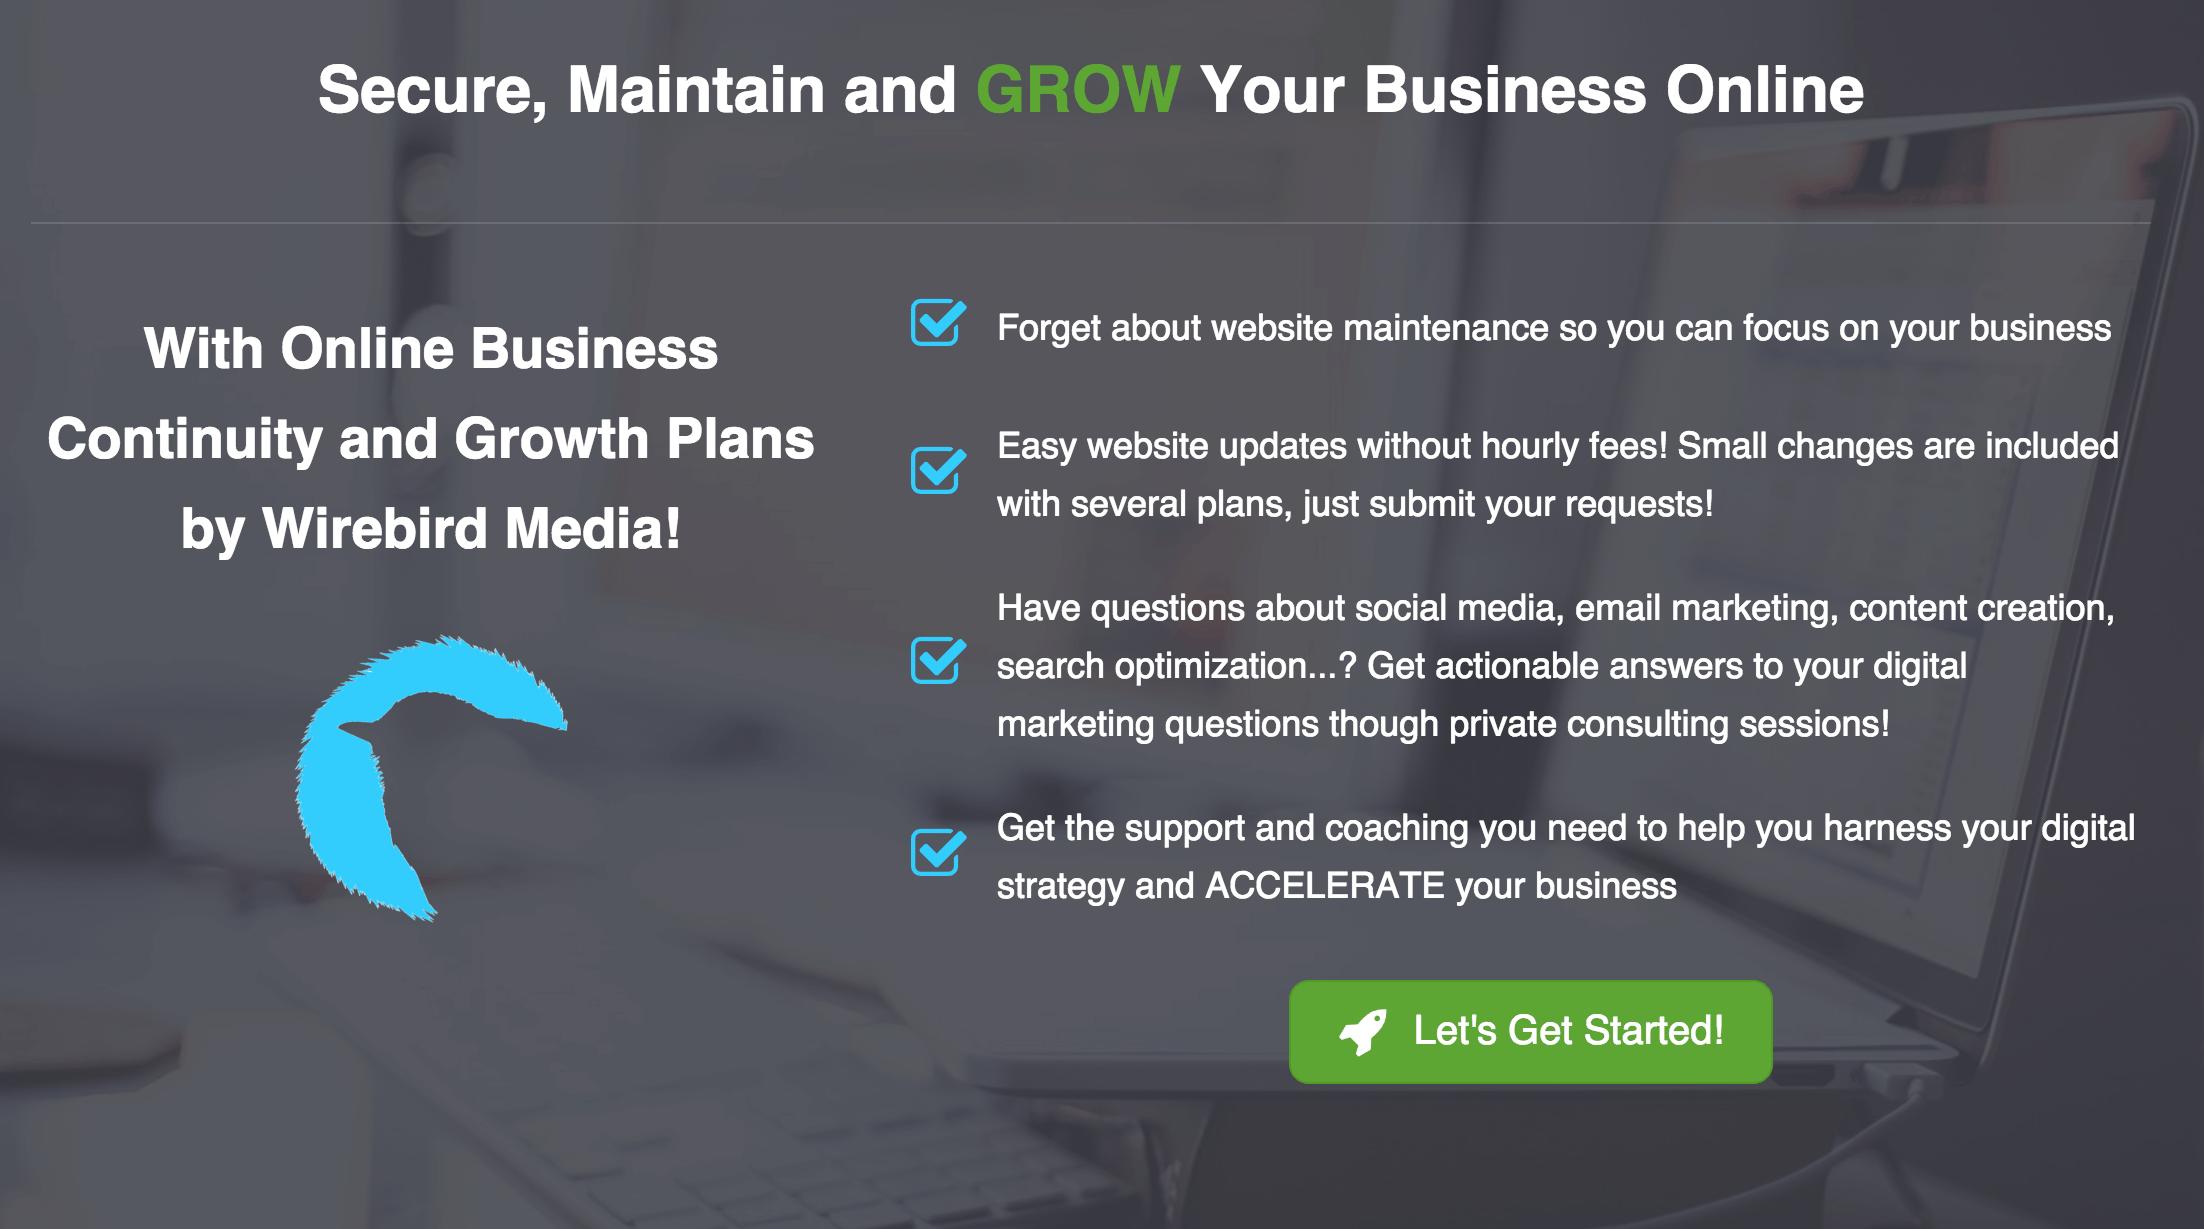 WordPress website Maintenance and online business growth plans from Wirebird Media